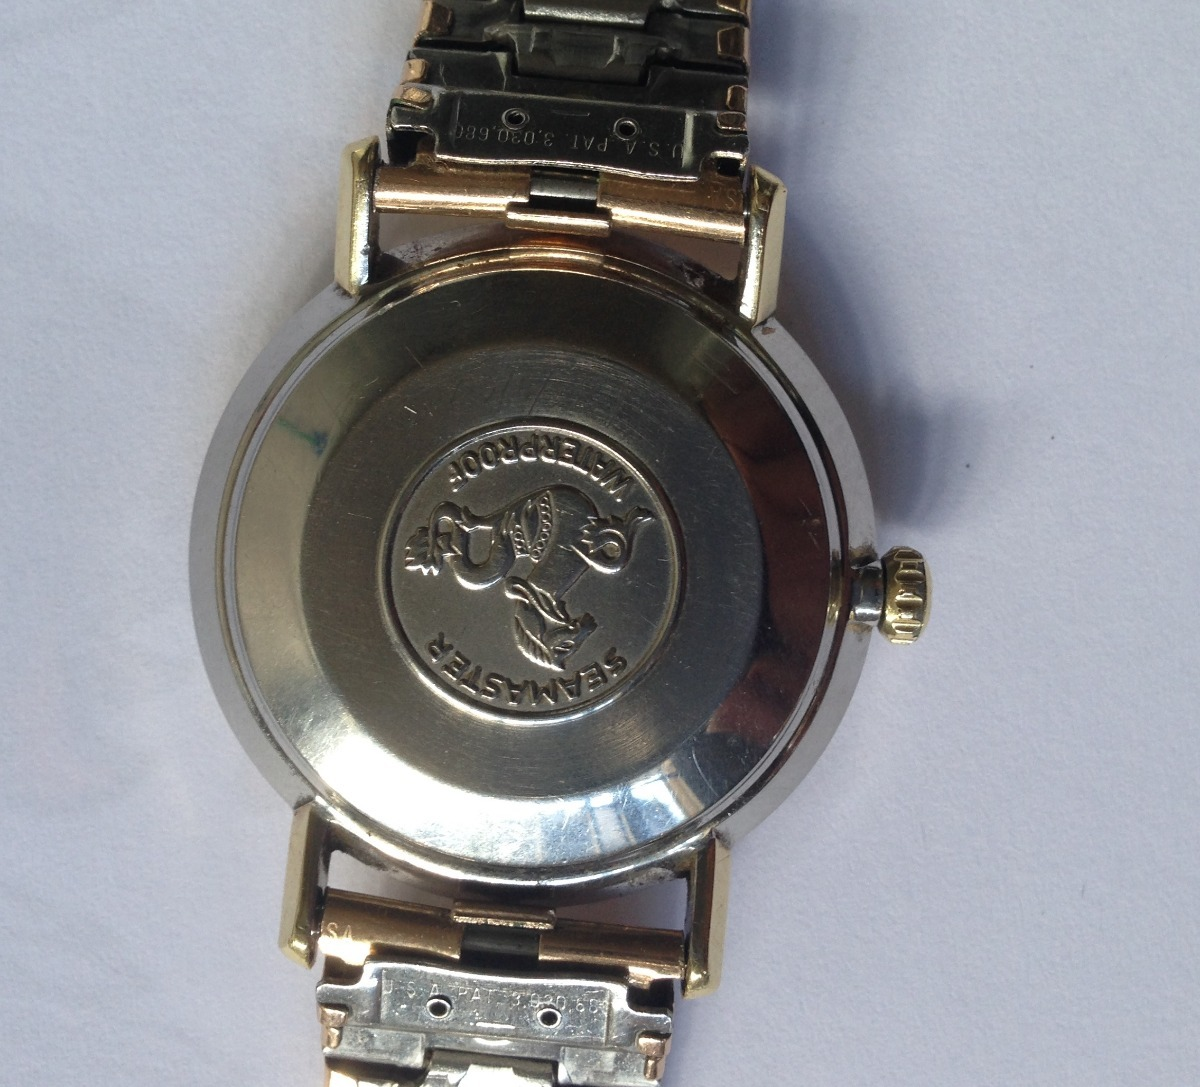 46a98785aa7 Relógio Omega - Auto - Swiss - Ful A Ouro